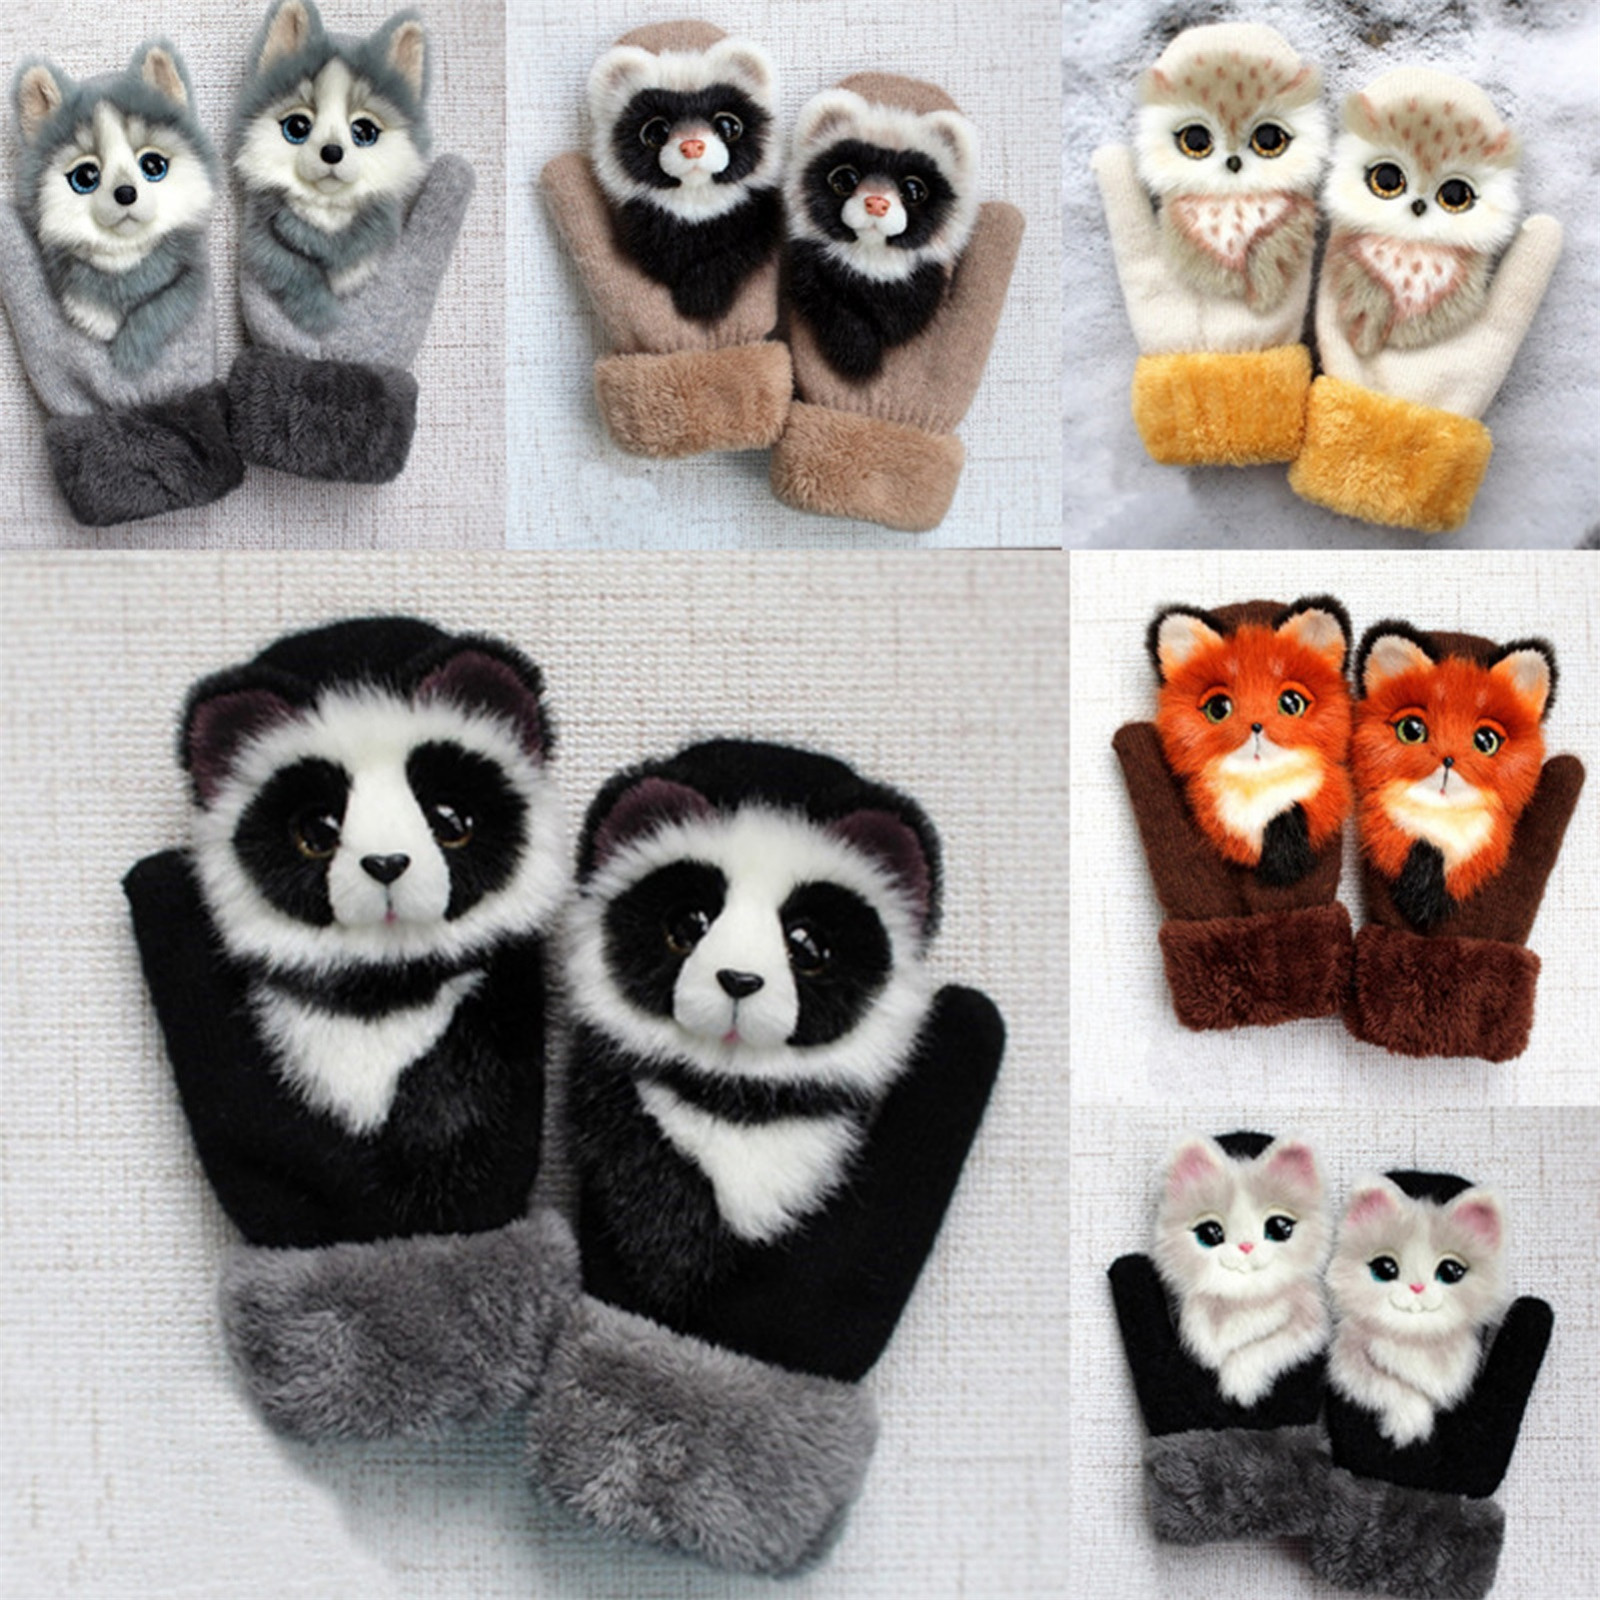 Winter Super Warm Gloves Cute Cat 3d Protective Gloves Winter Accessories Running Gloves Warm For Men And Women Half Finger 2021